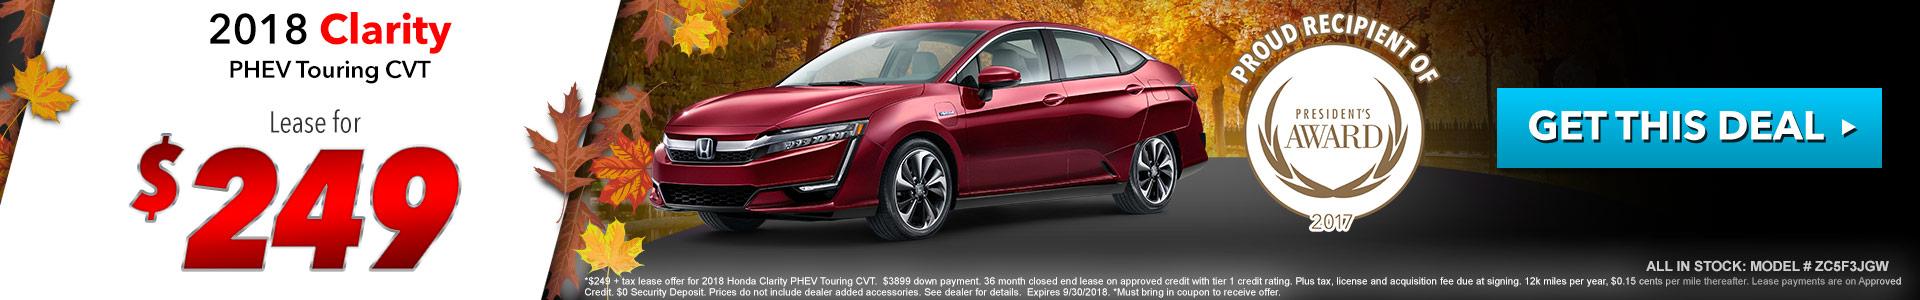 Honda Clarity $249 Lease